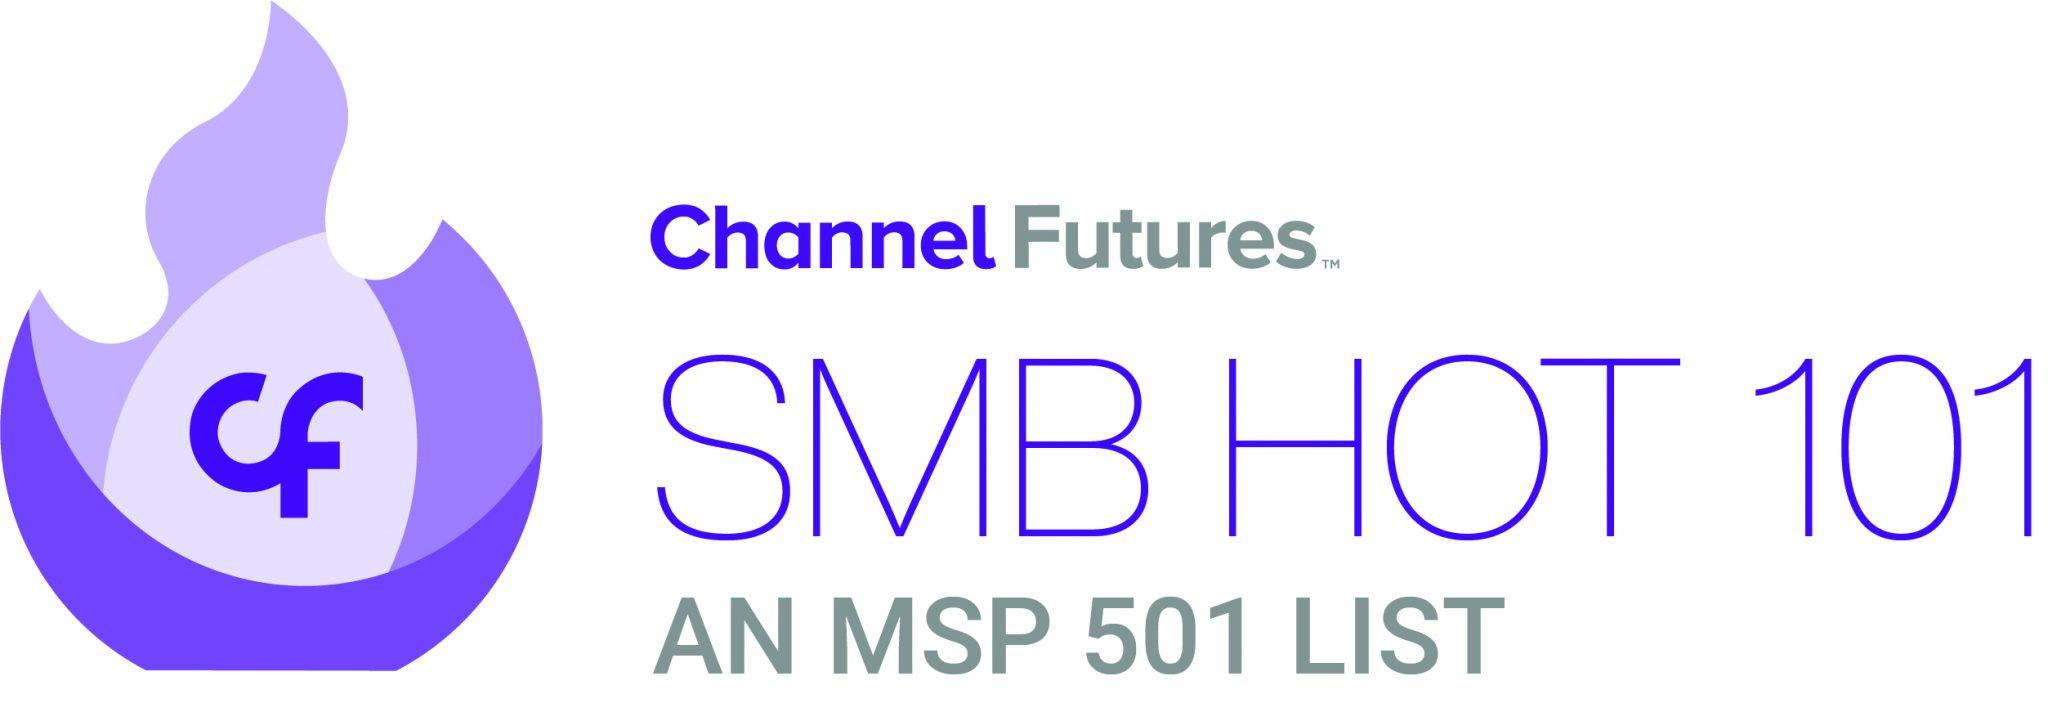 SMB Hot 101 Logo